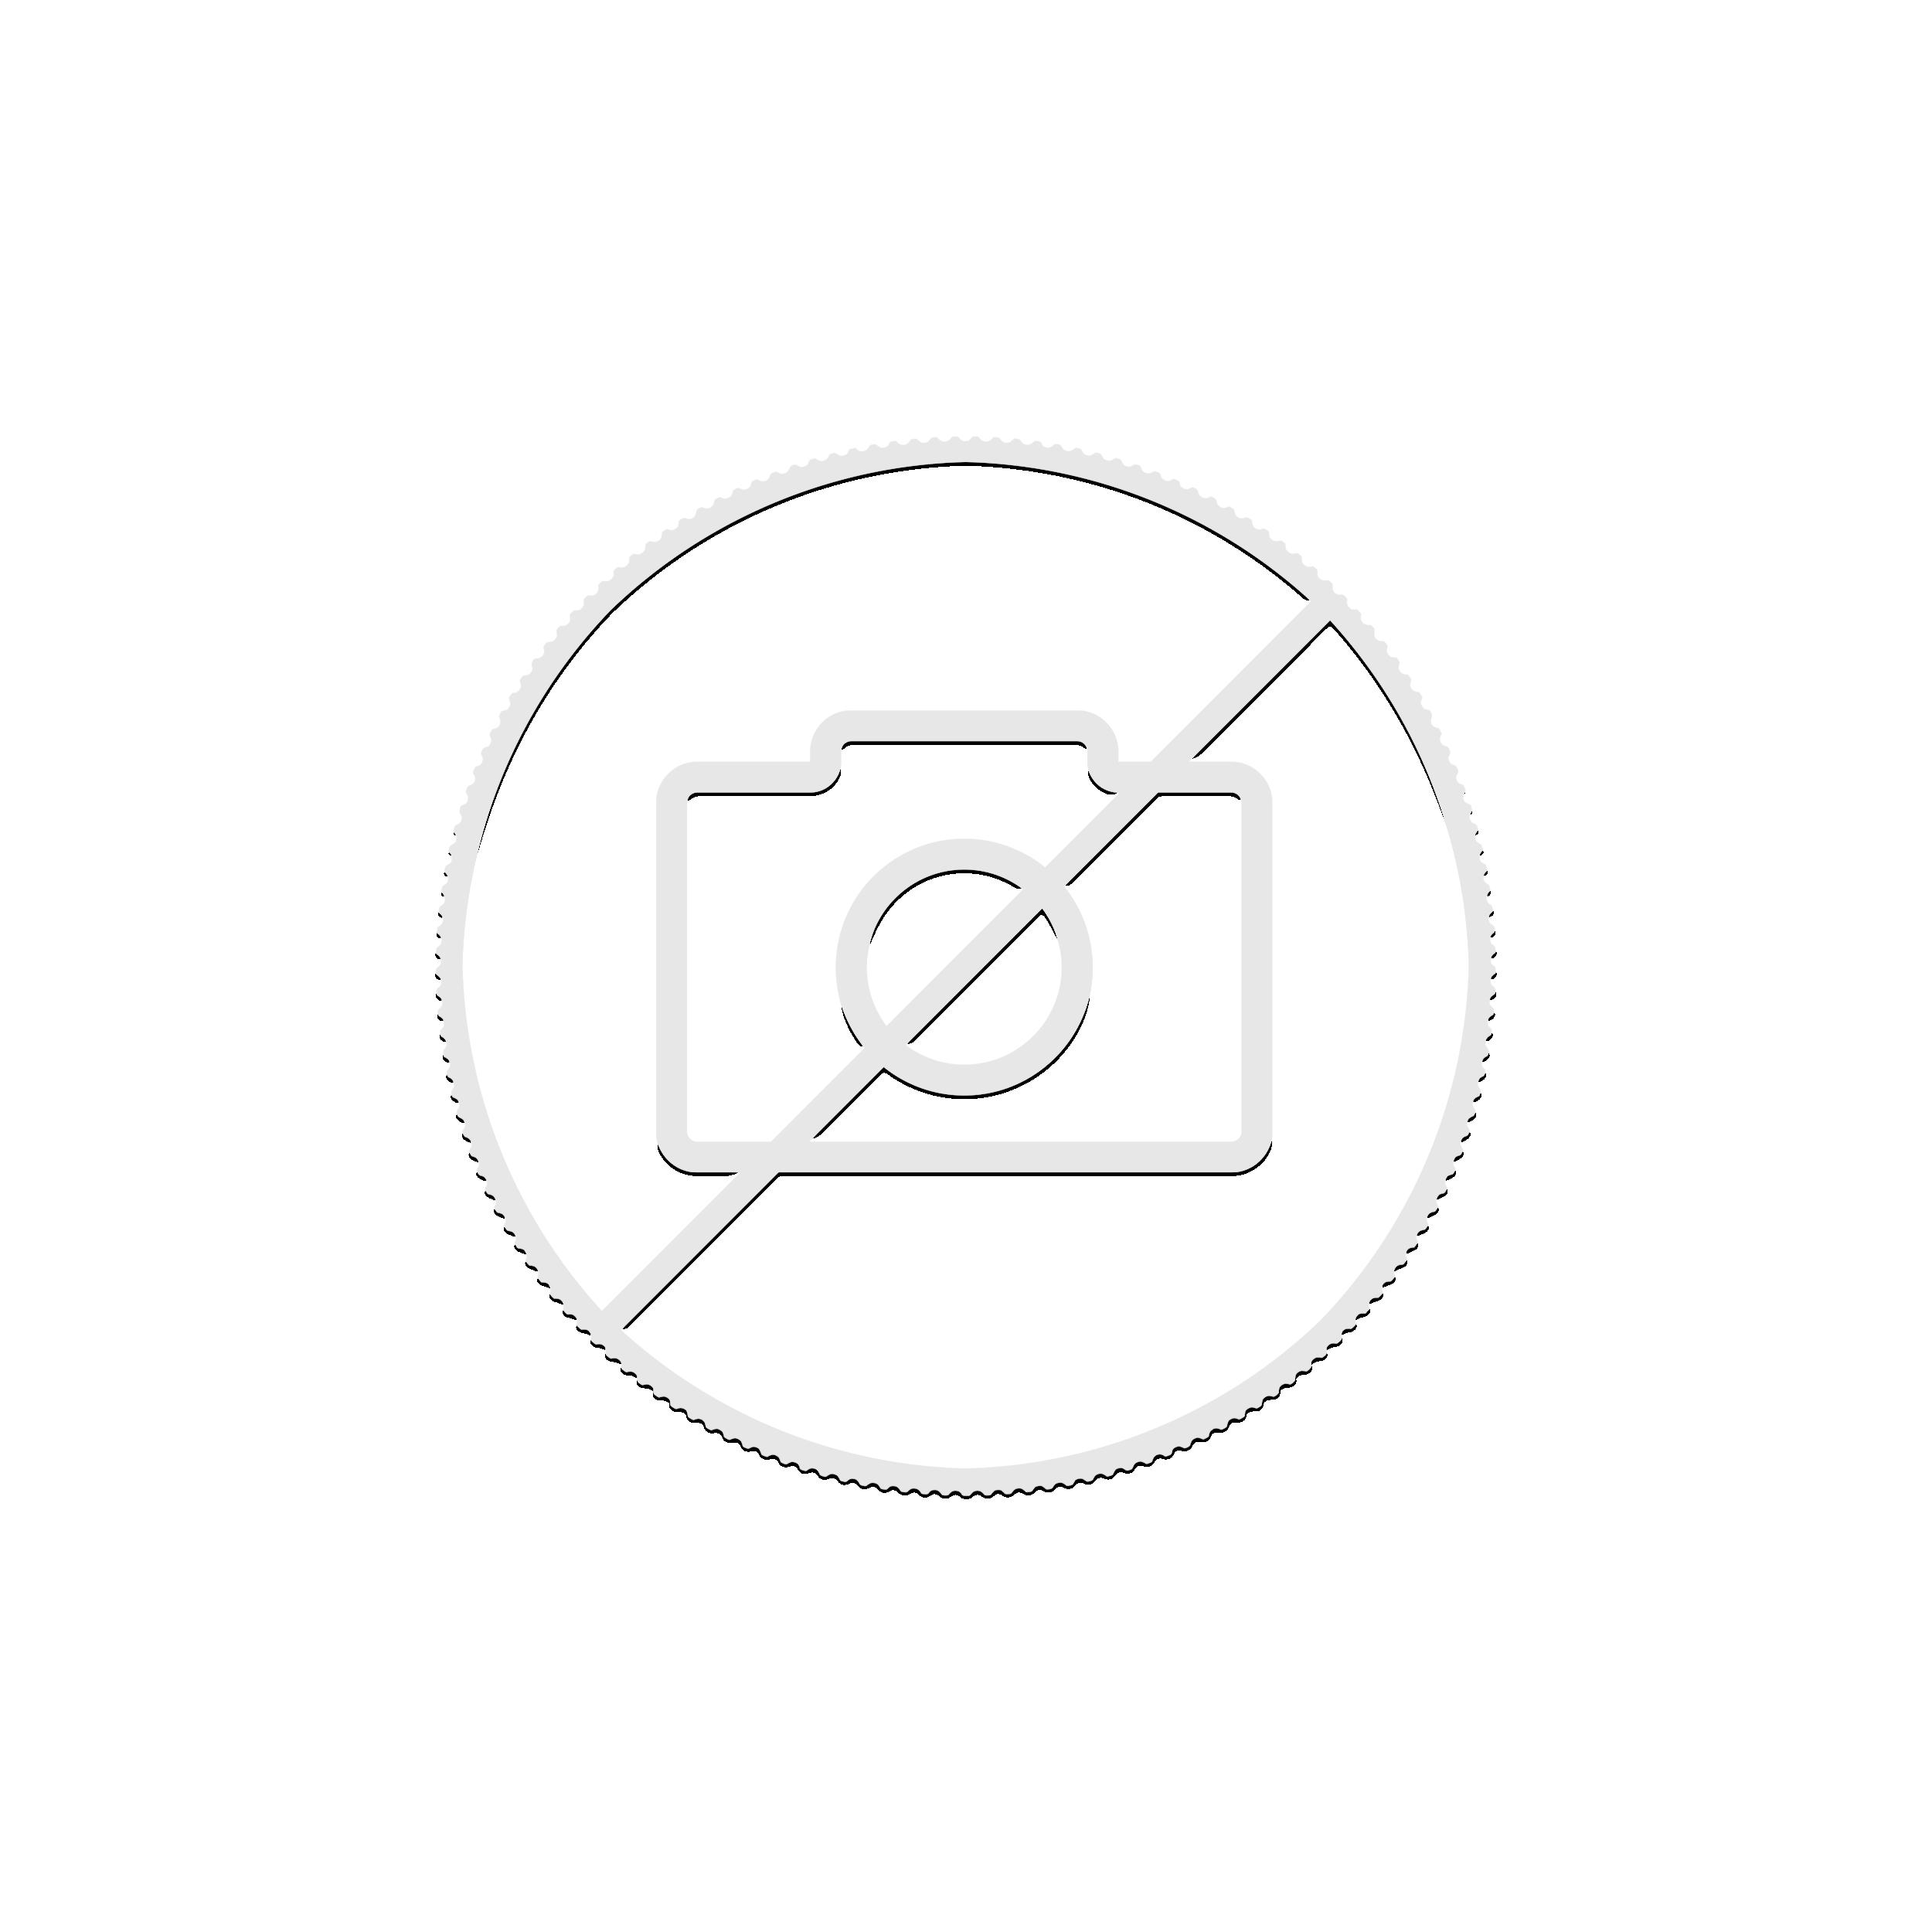 2 troy ounce zilveren munt Duowentian